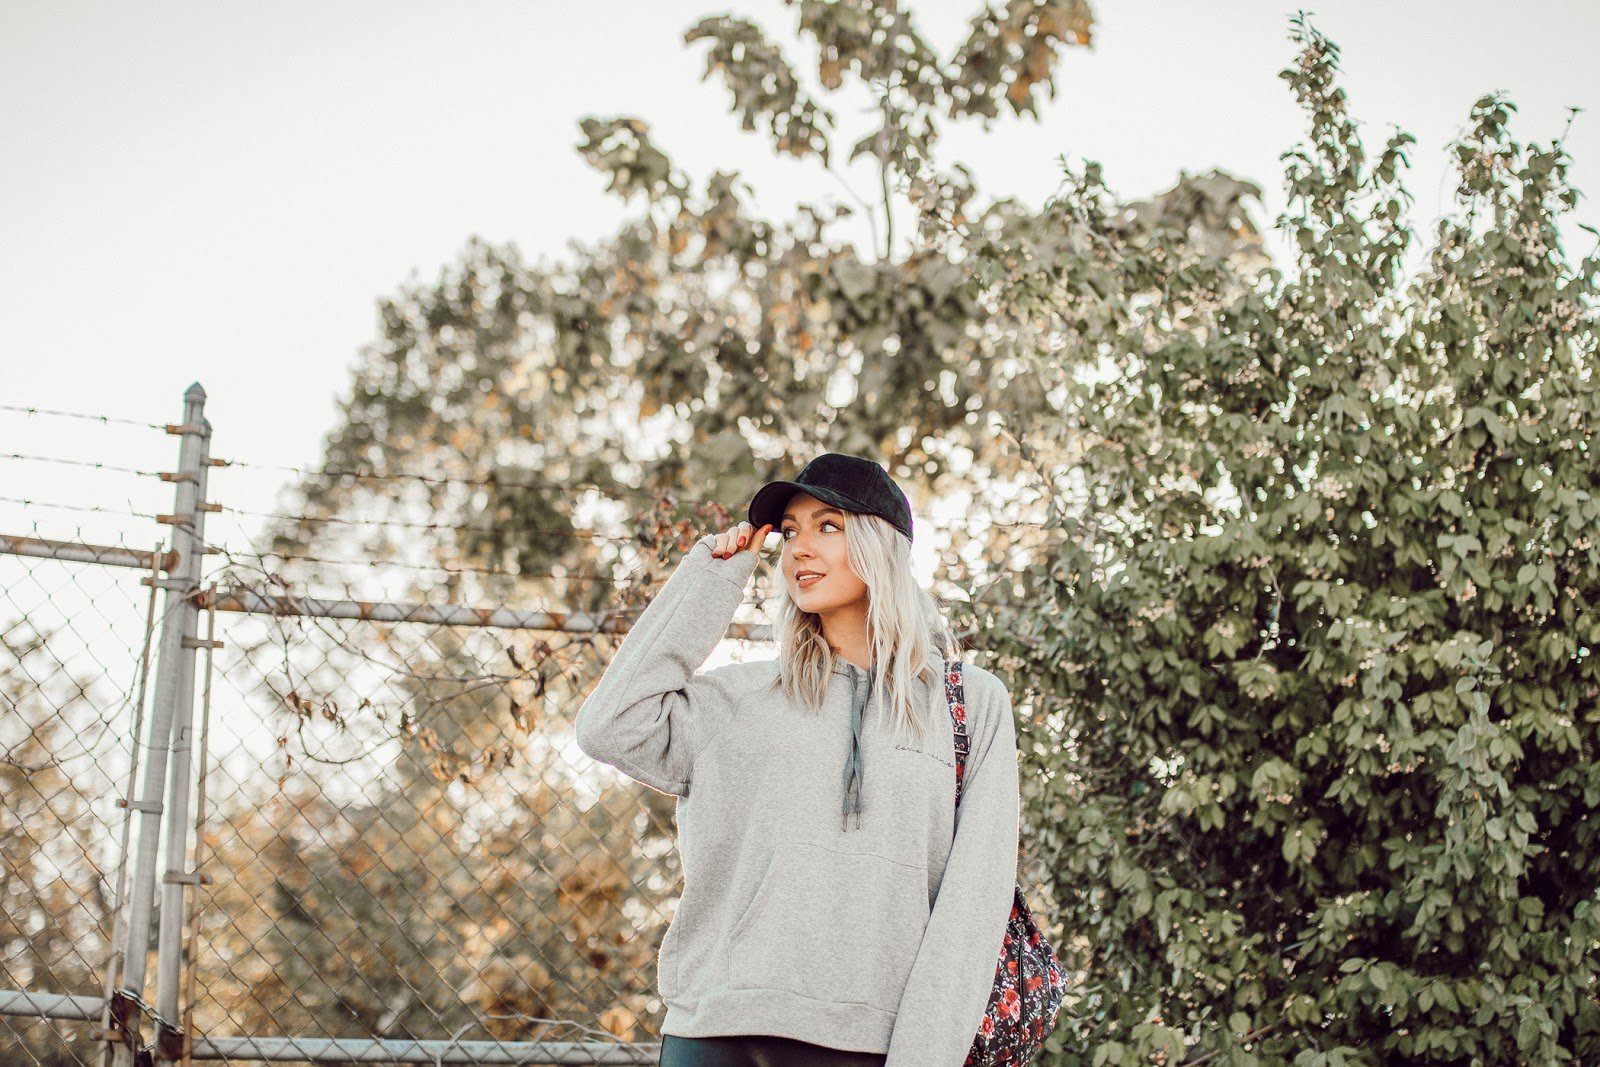 hoodie + baseball cap